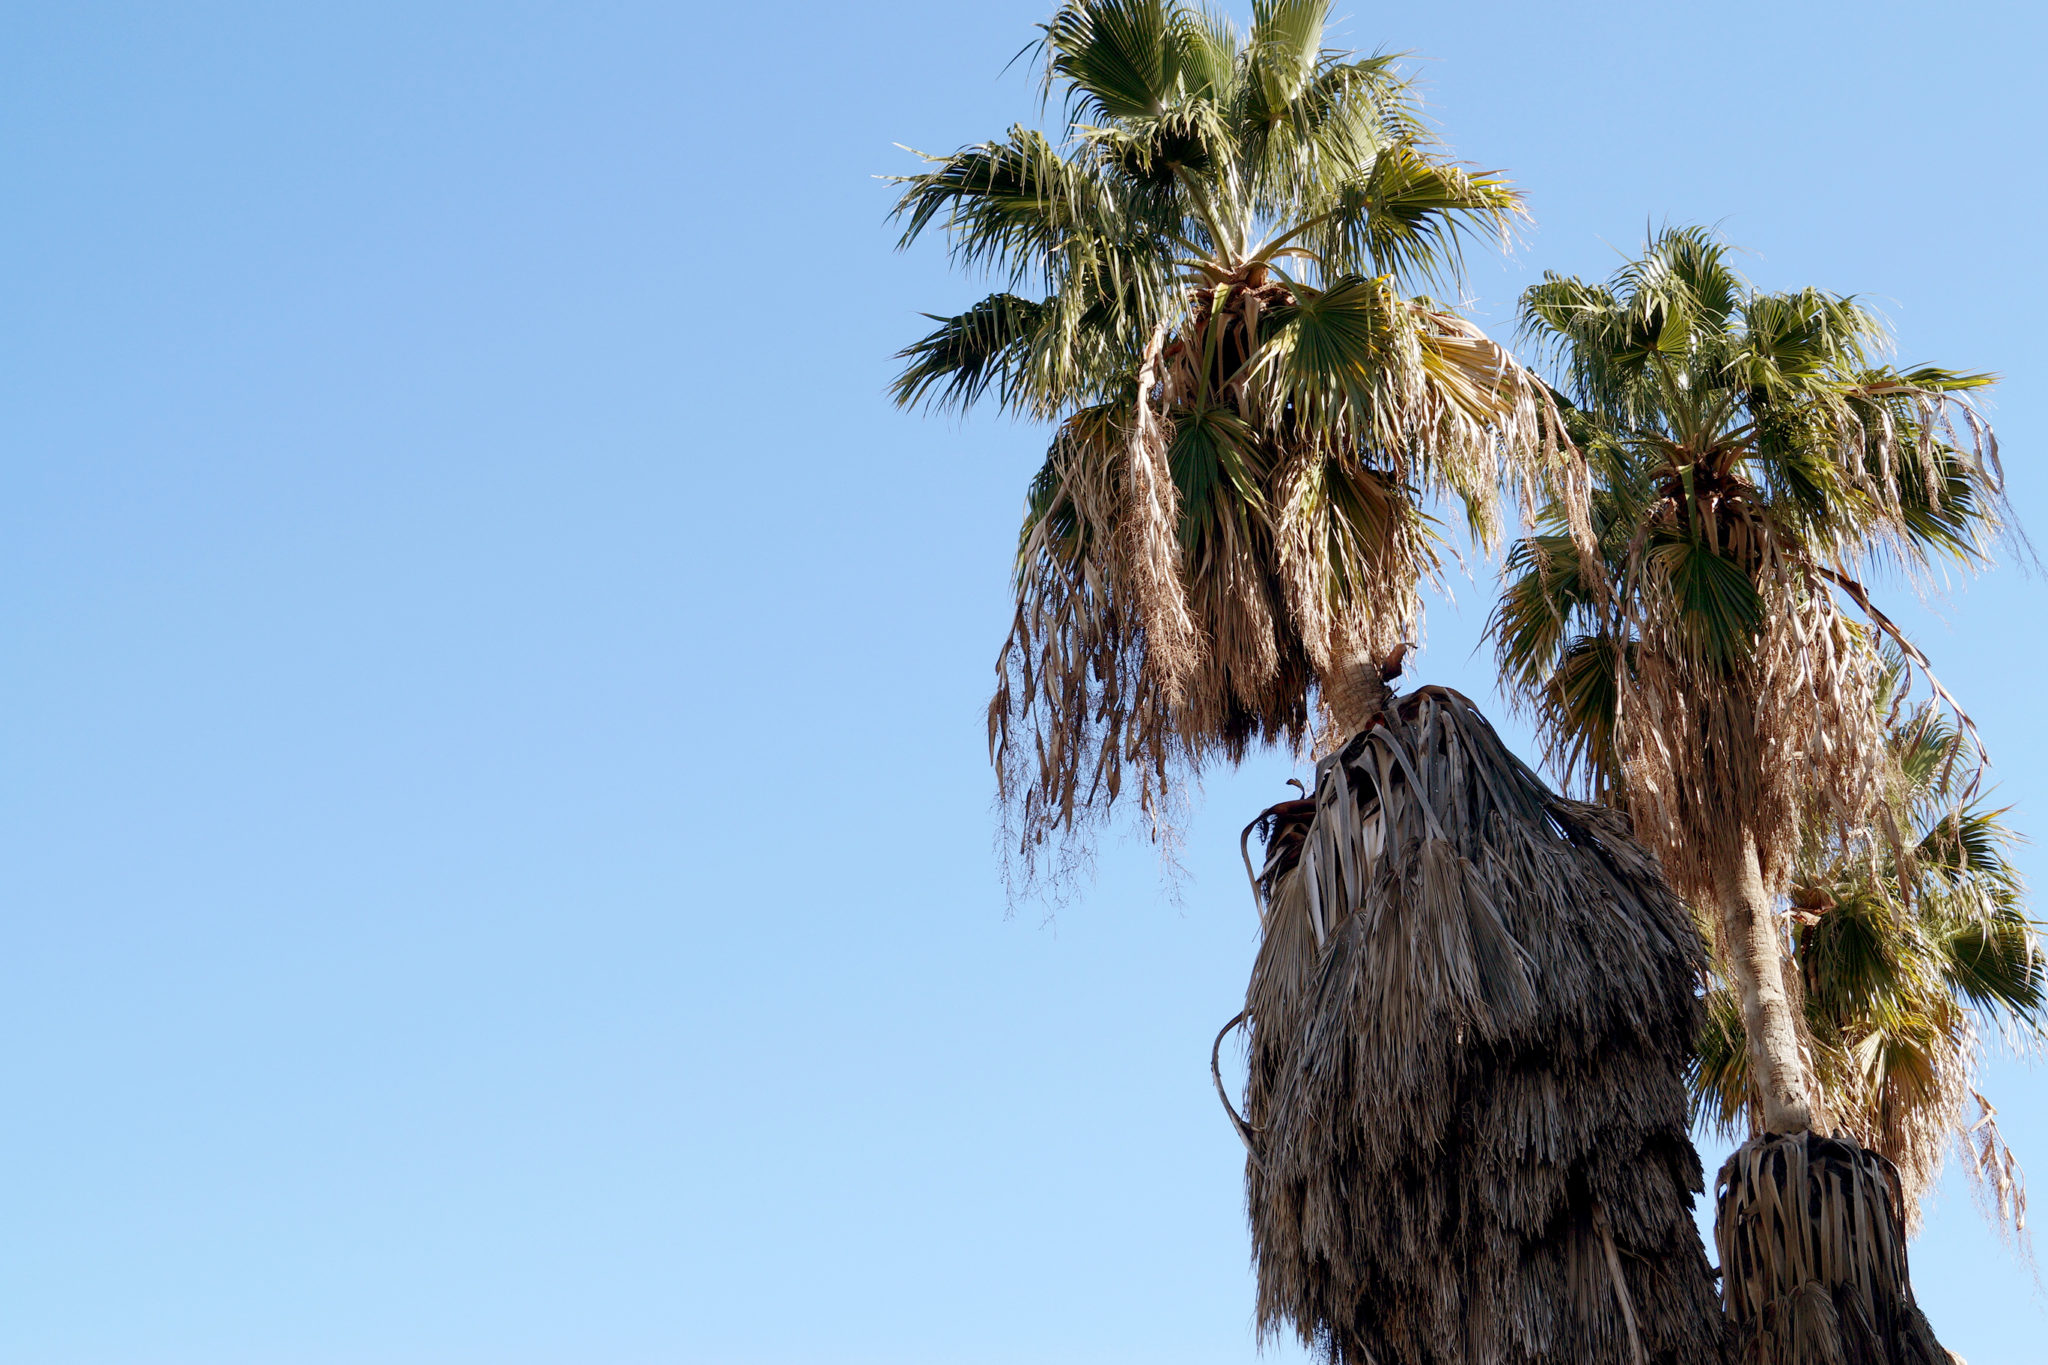 Libanon Reisen versprühen Urlaubsflair